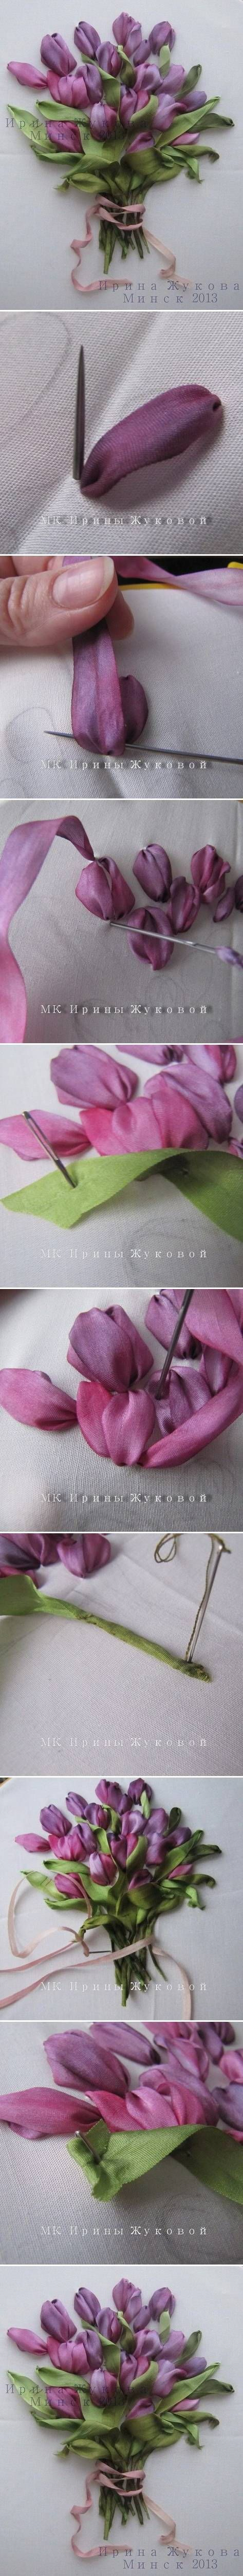 DIY Embroidery Ribbo